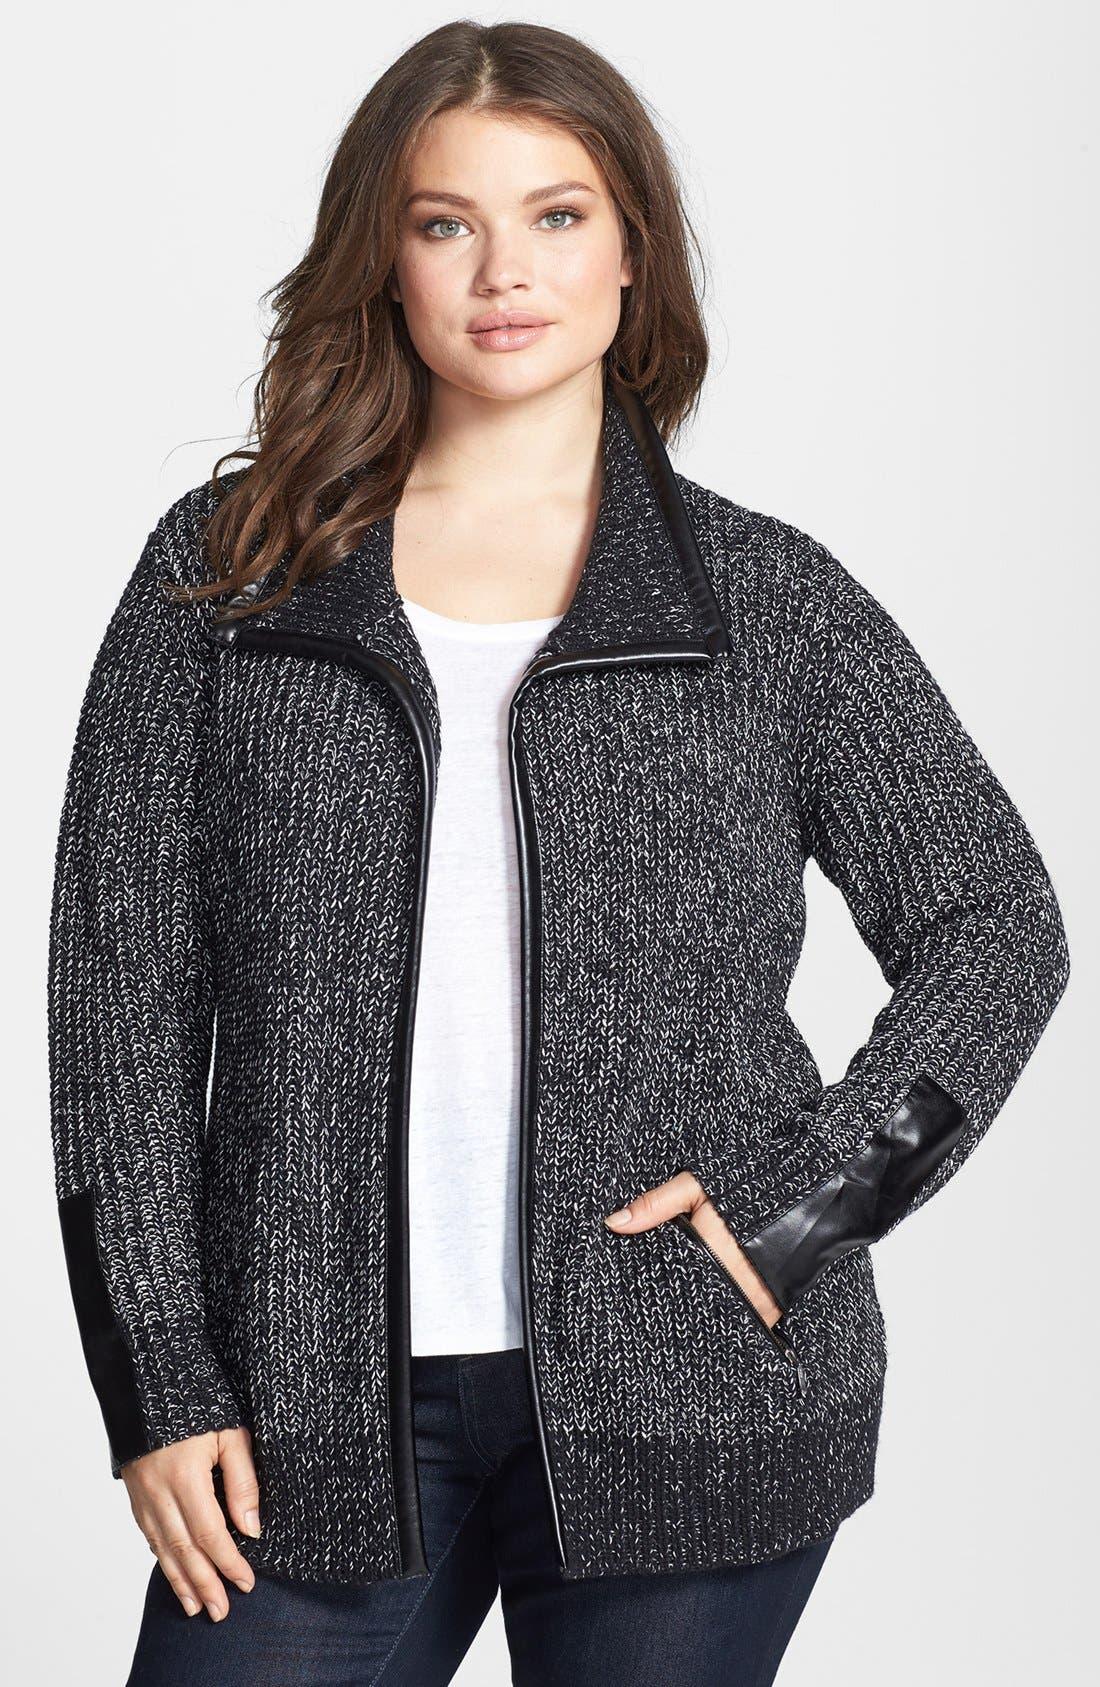 Alternate Image 1 Selected - Sejour Faux Leather Trim Open Front Knit Jacket (Plus Size)